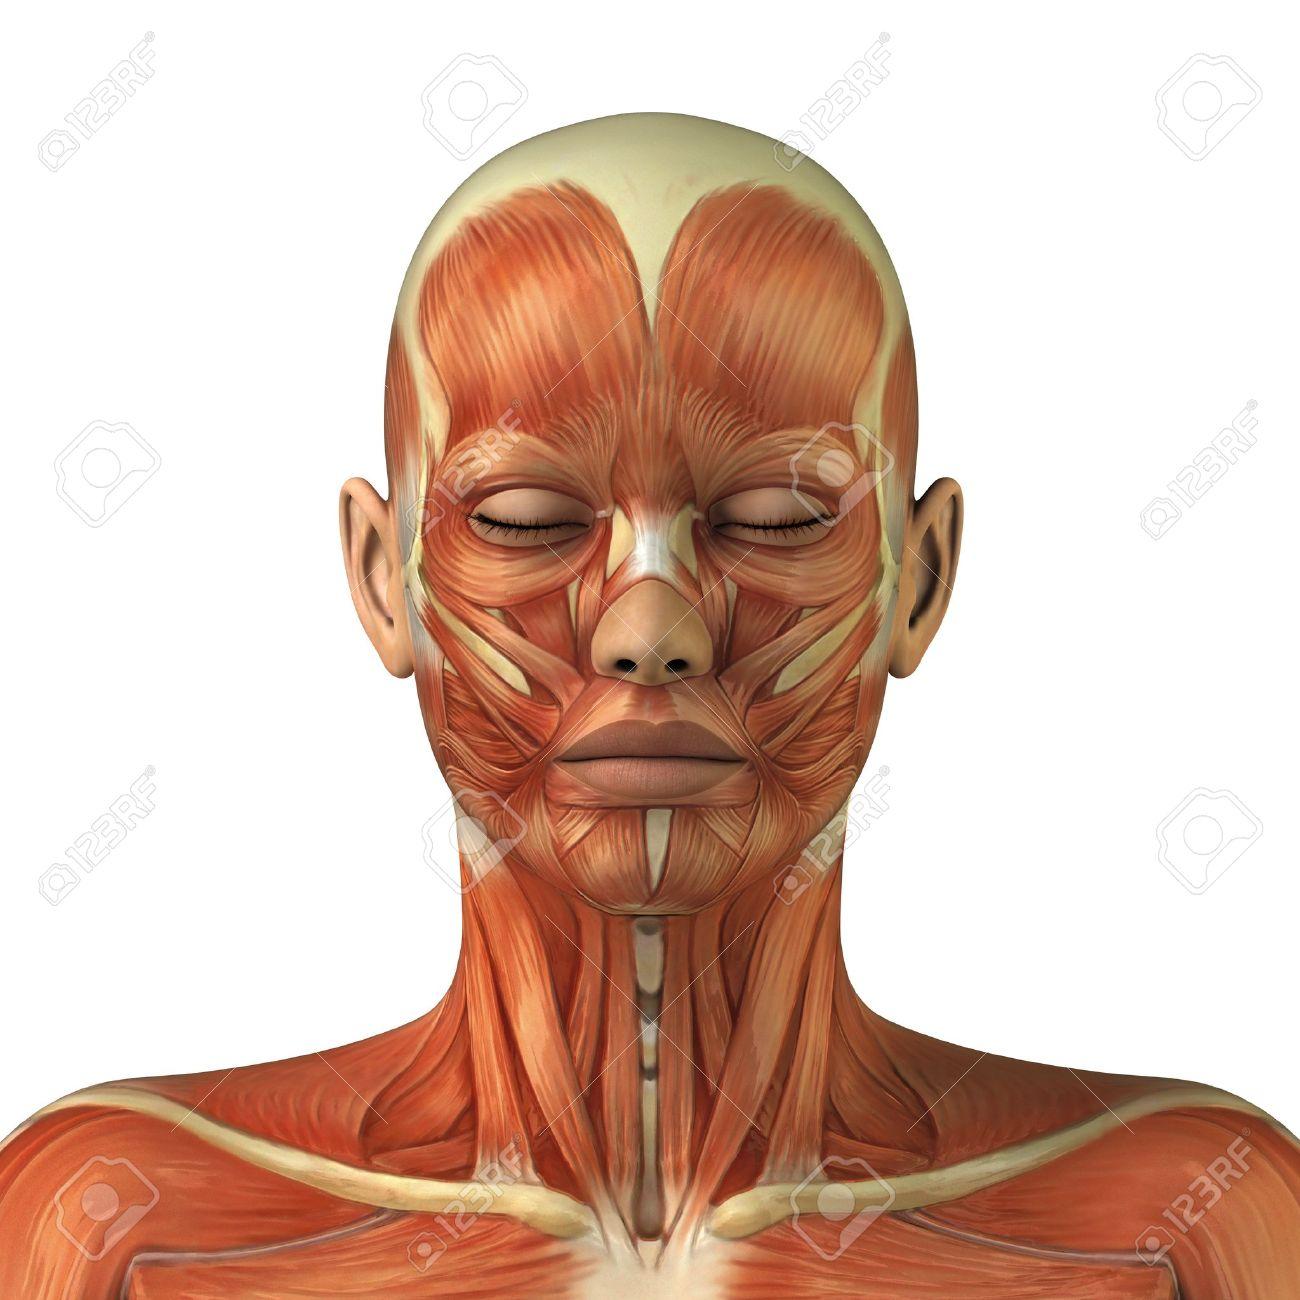 Body without skin anterior view Stock Photo - 9609301